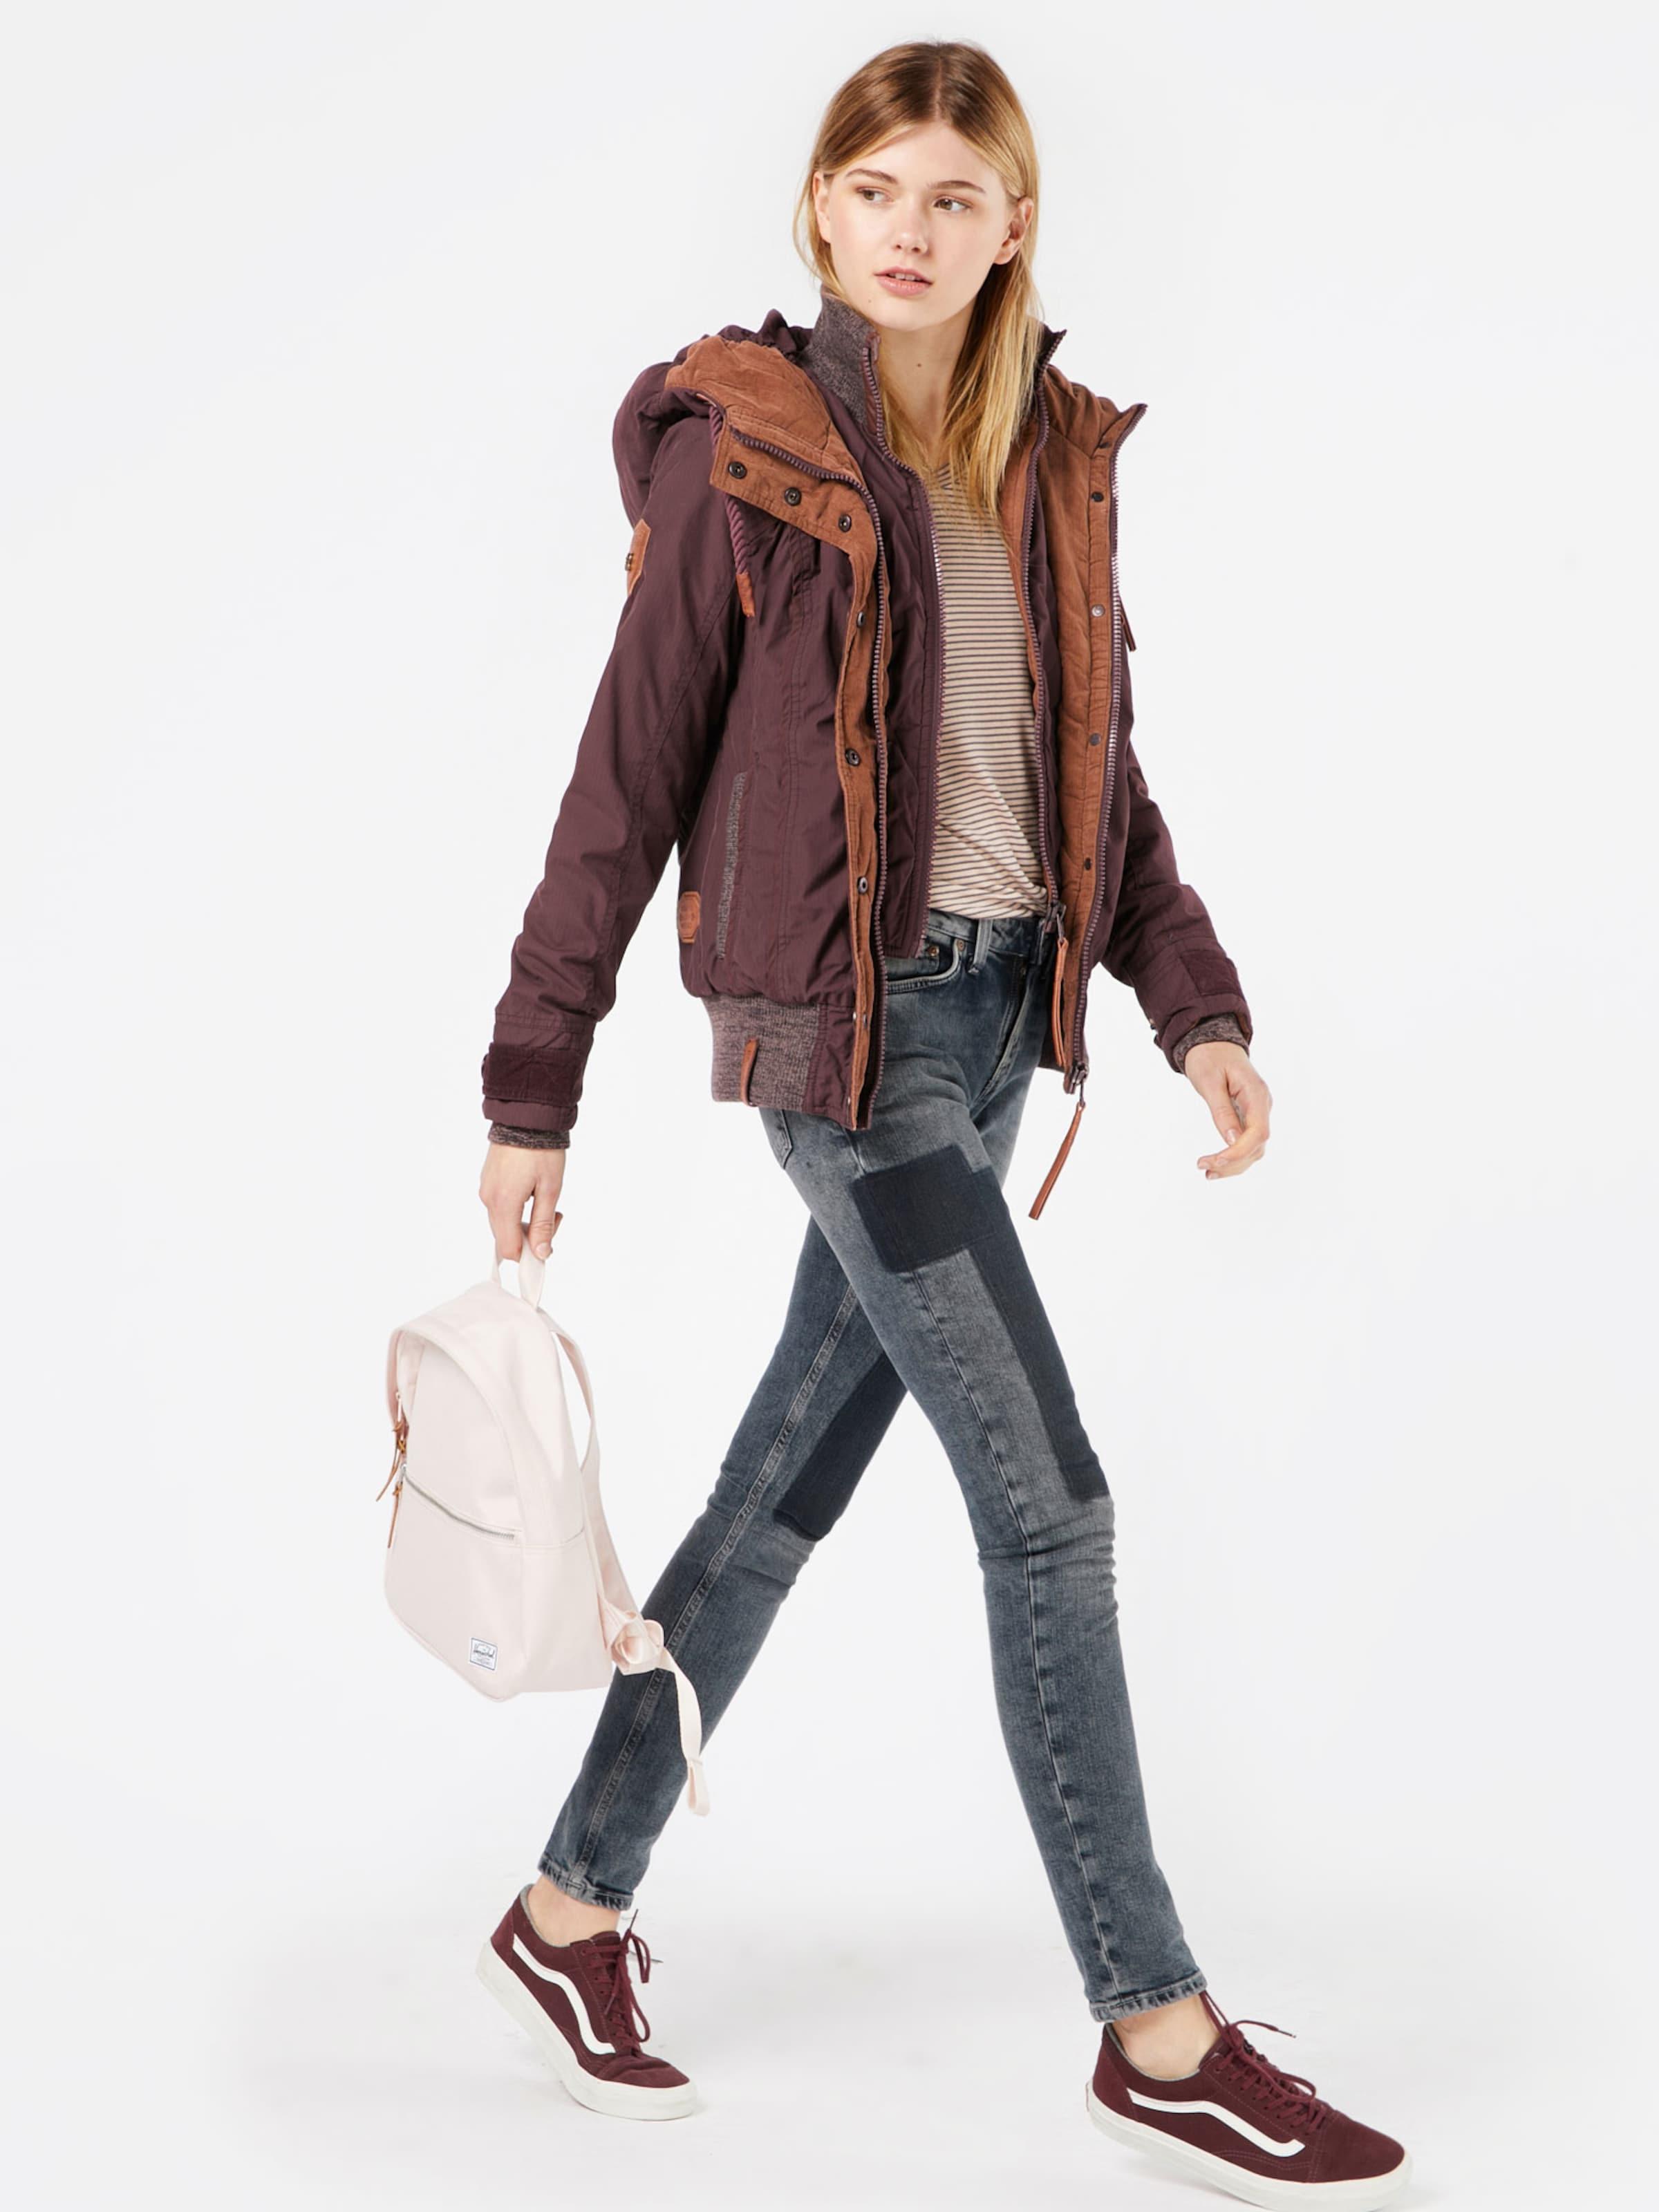 naketano Female Jacket 'Shortcut IV' Auslass Sneakernews Billig Verkaufen Billig Do7W1DU